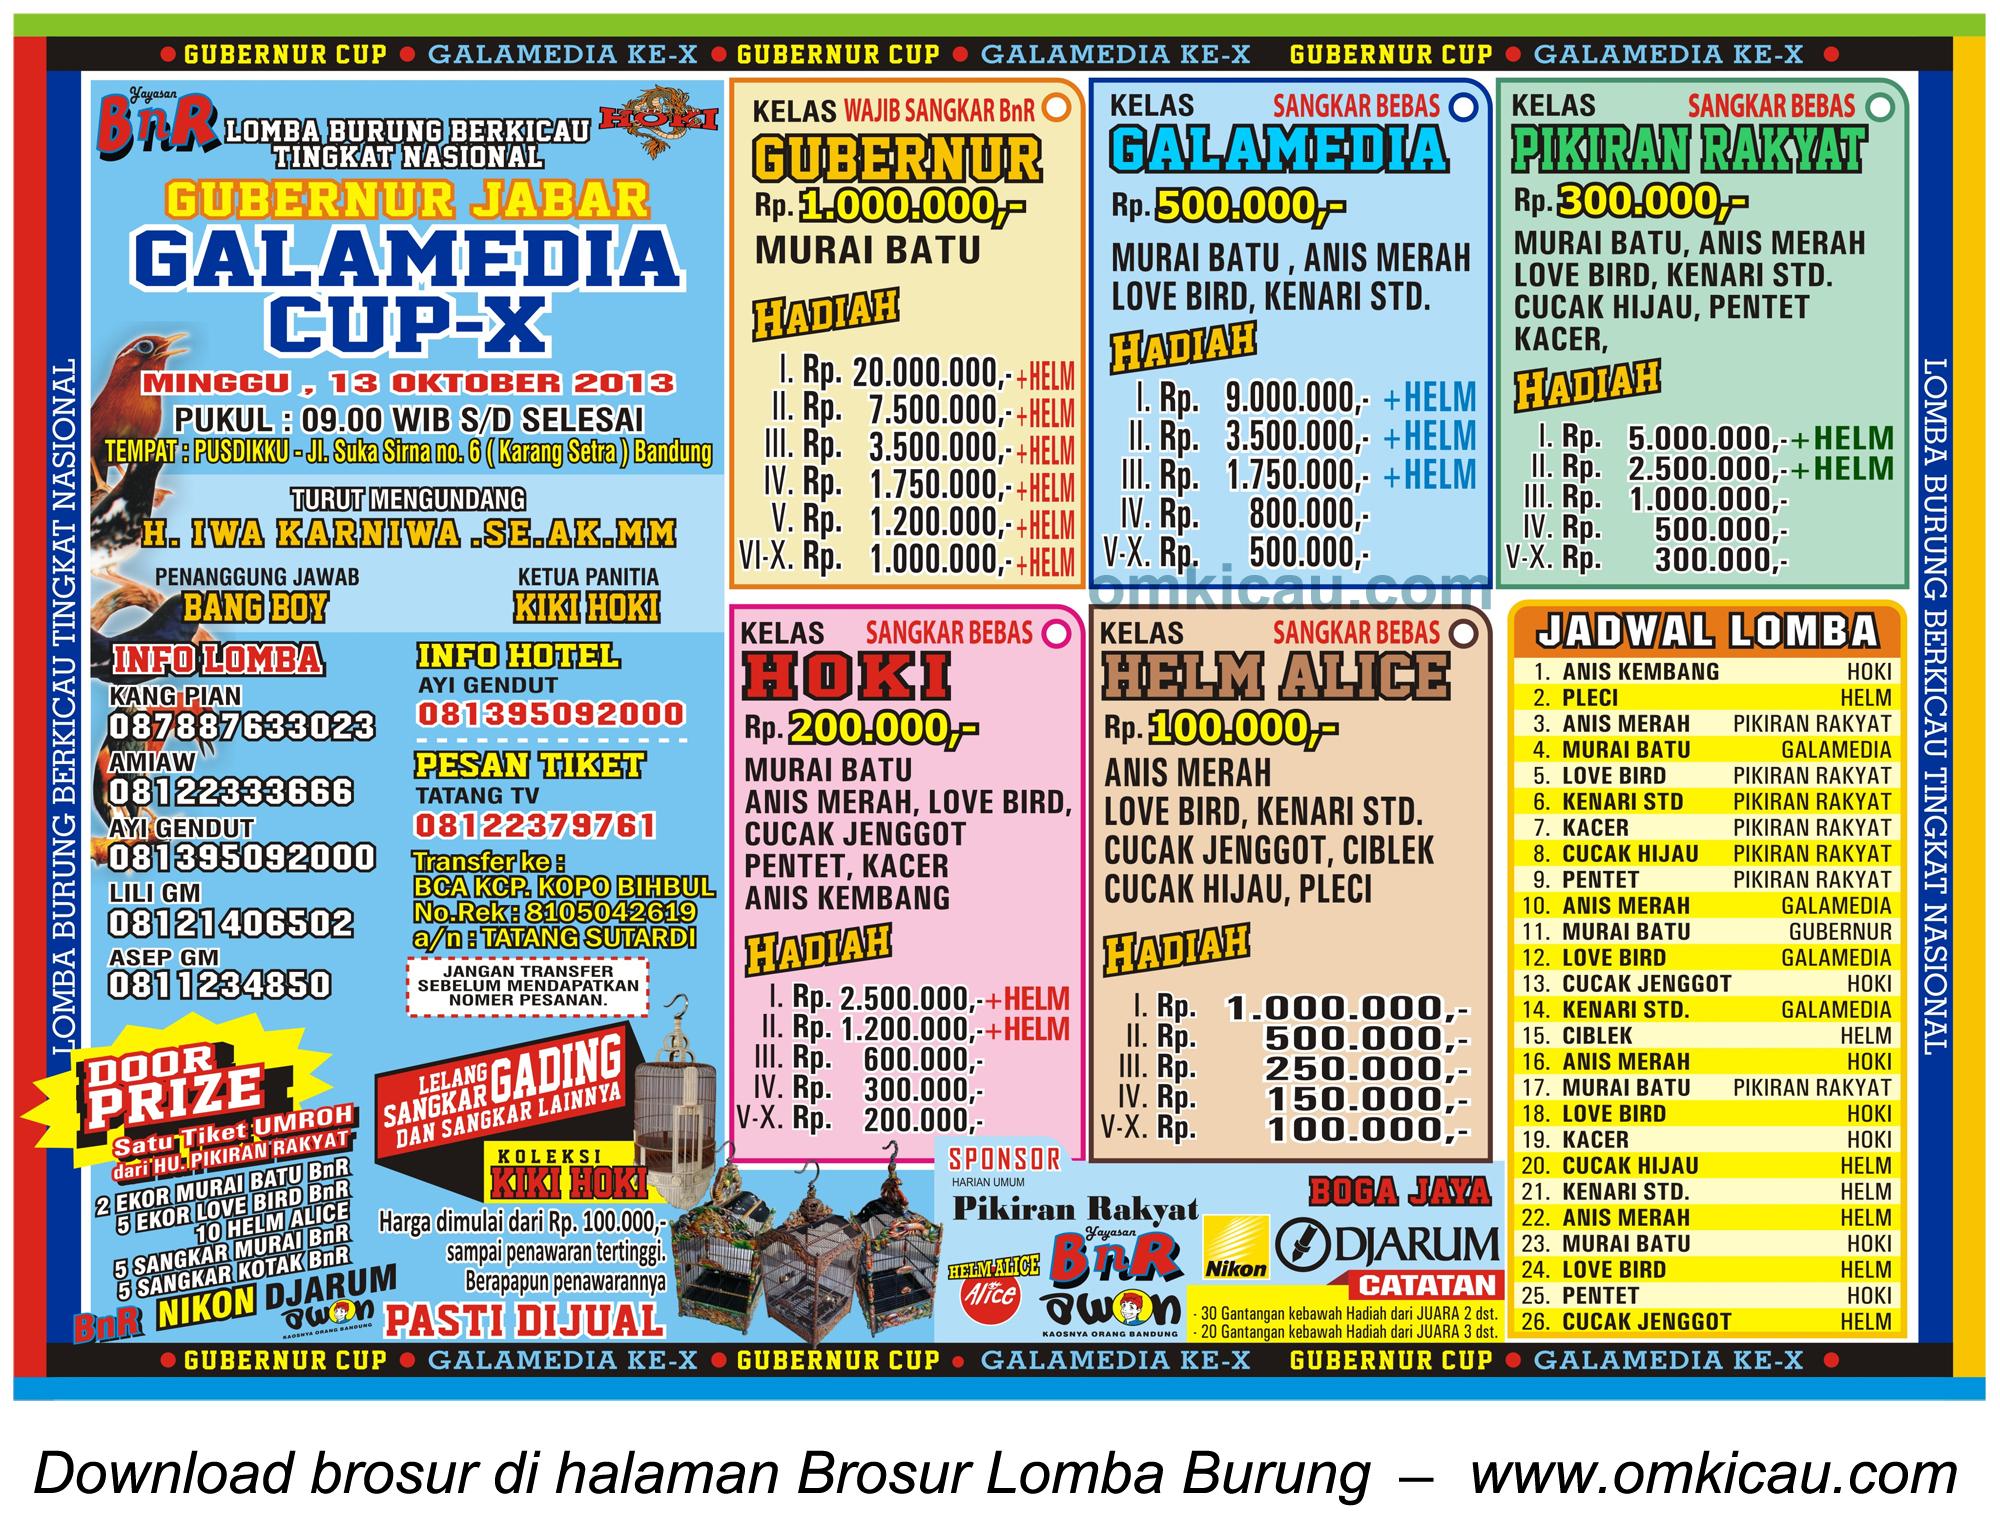 Brosur Lomba Burung Gubenur Jabar - Galamedia Cup X, Bandung, 13 Oktober 2013